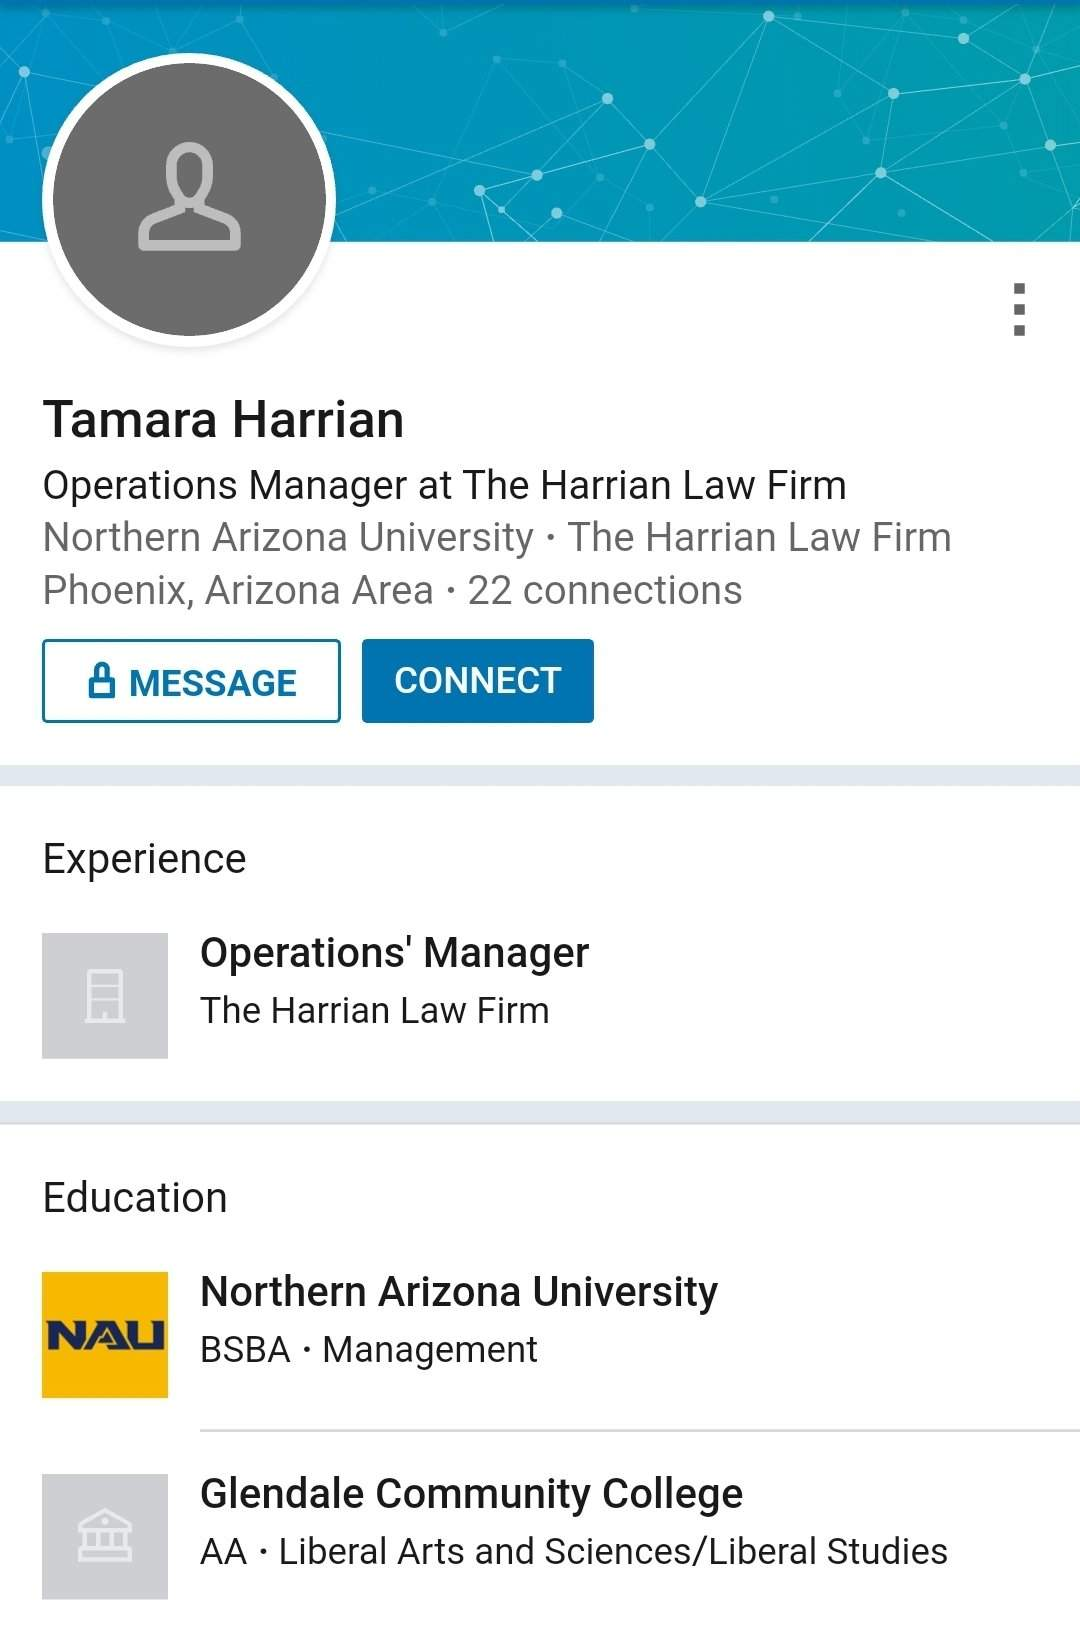 Tamara Harrian